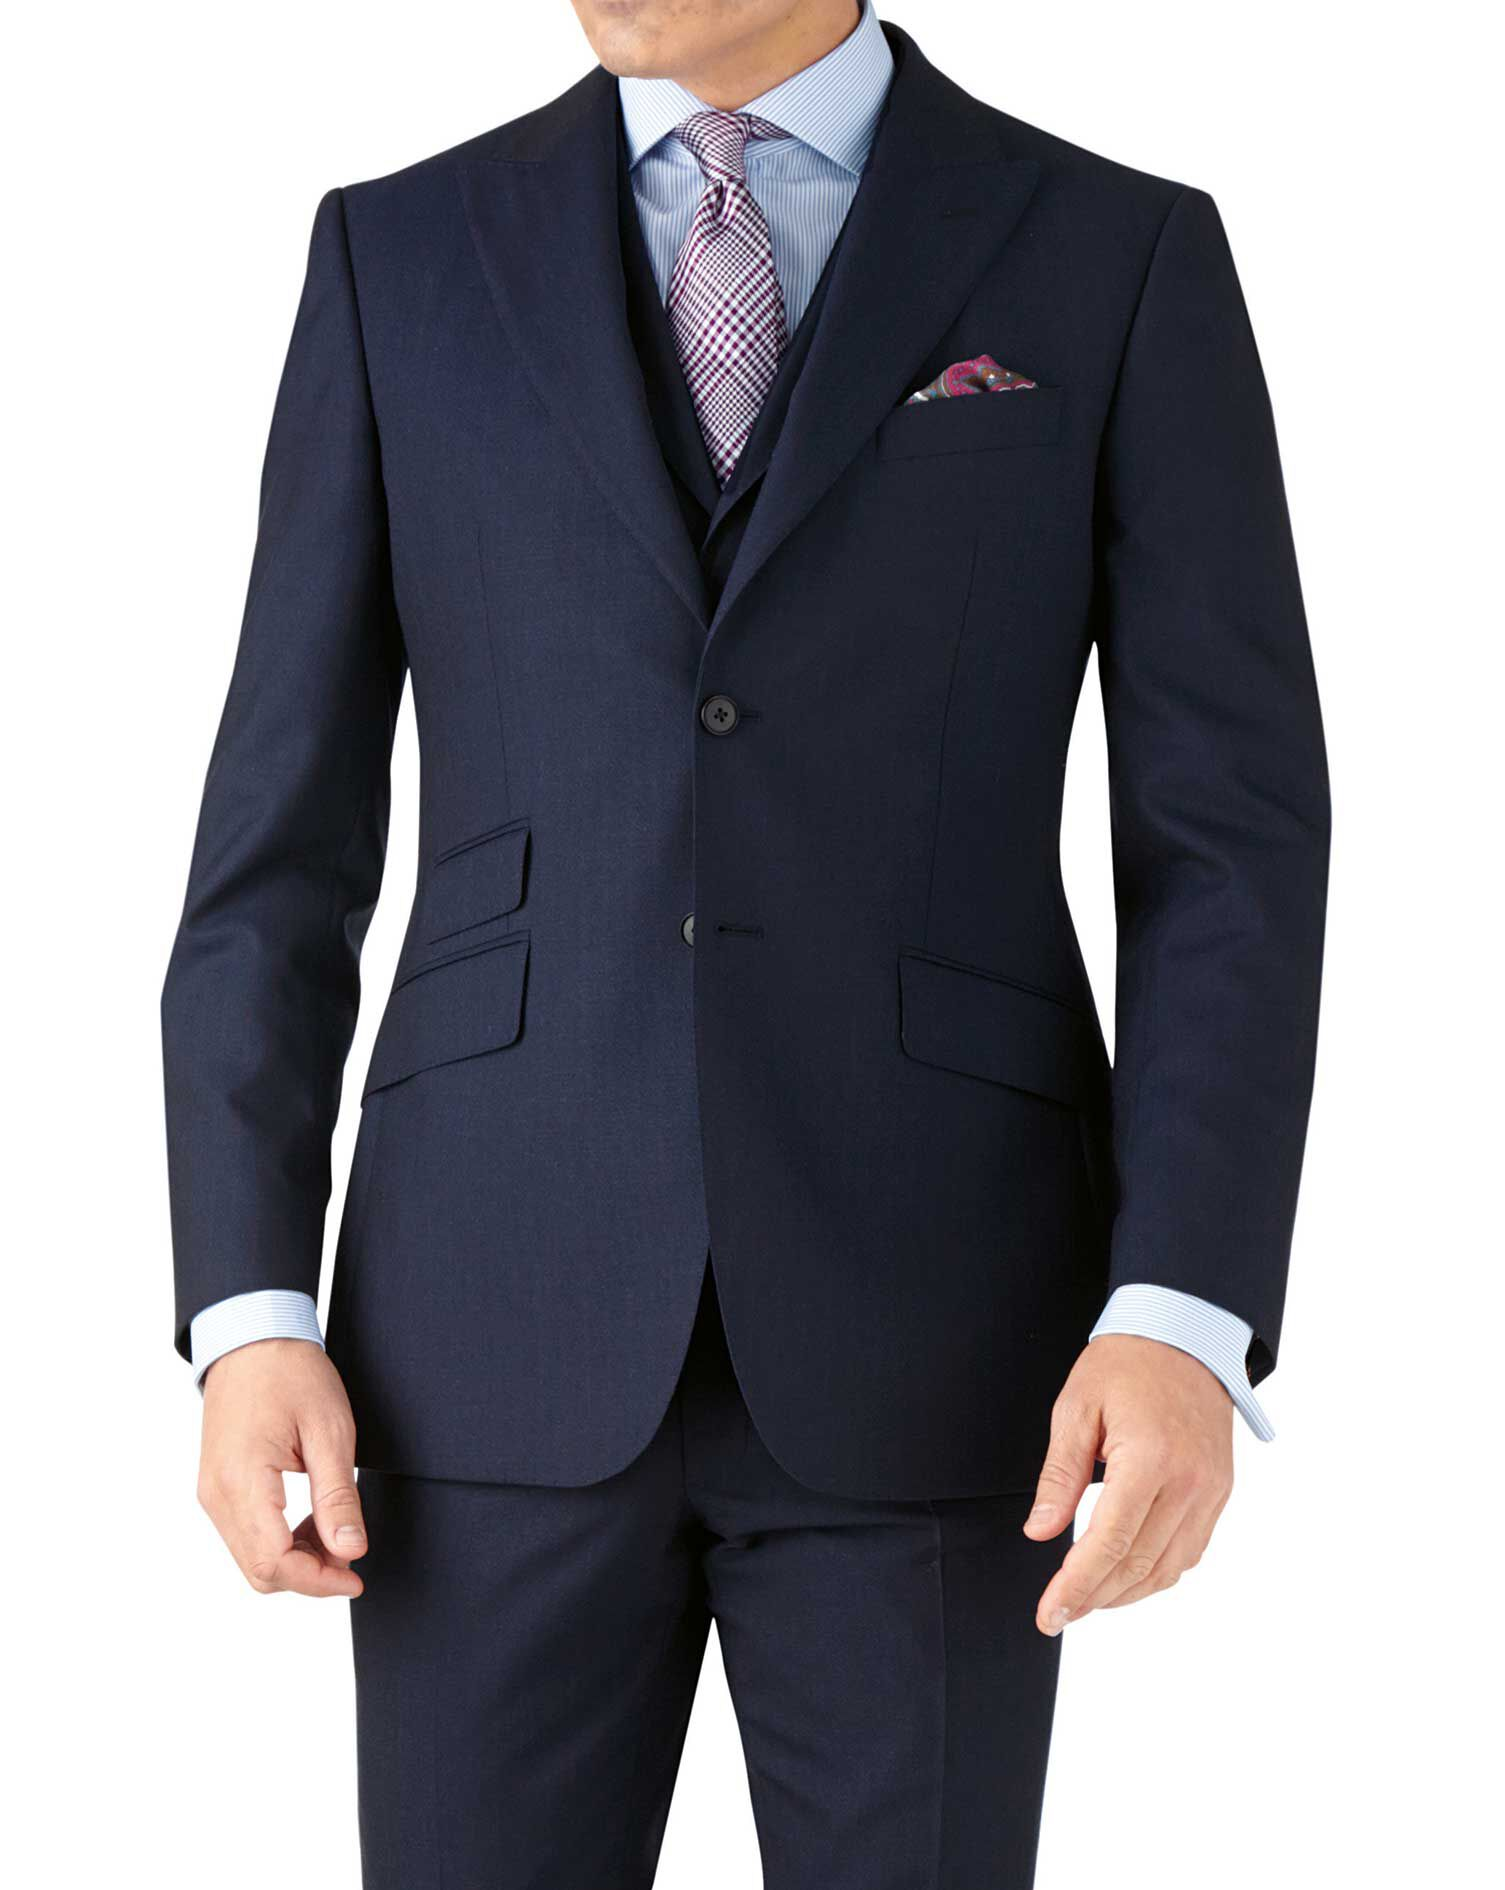 Blue Stripe Slim Fit Panama Business Suit Wool Jacket Size 36 Regular by Charles Tyrwhitt